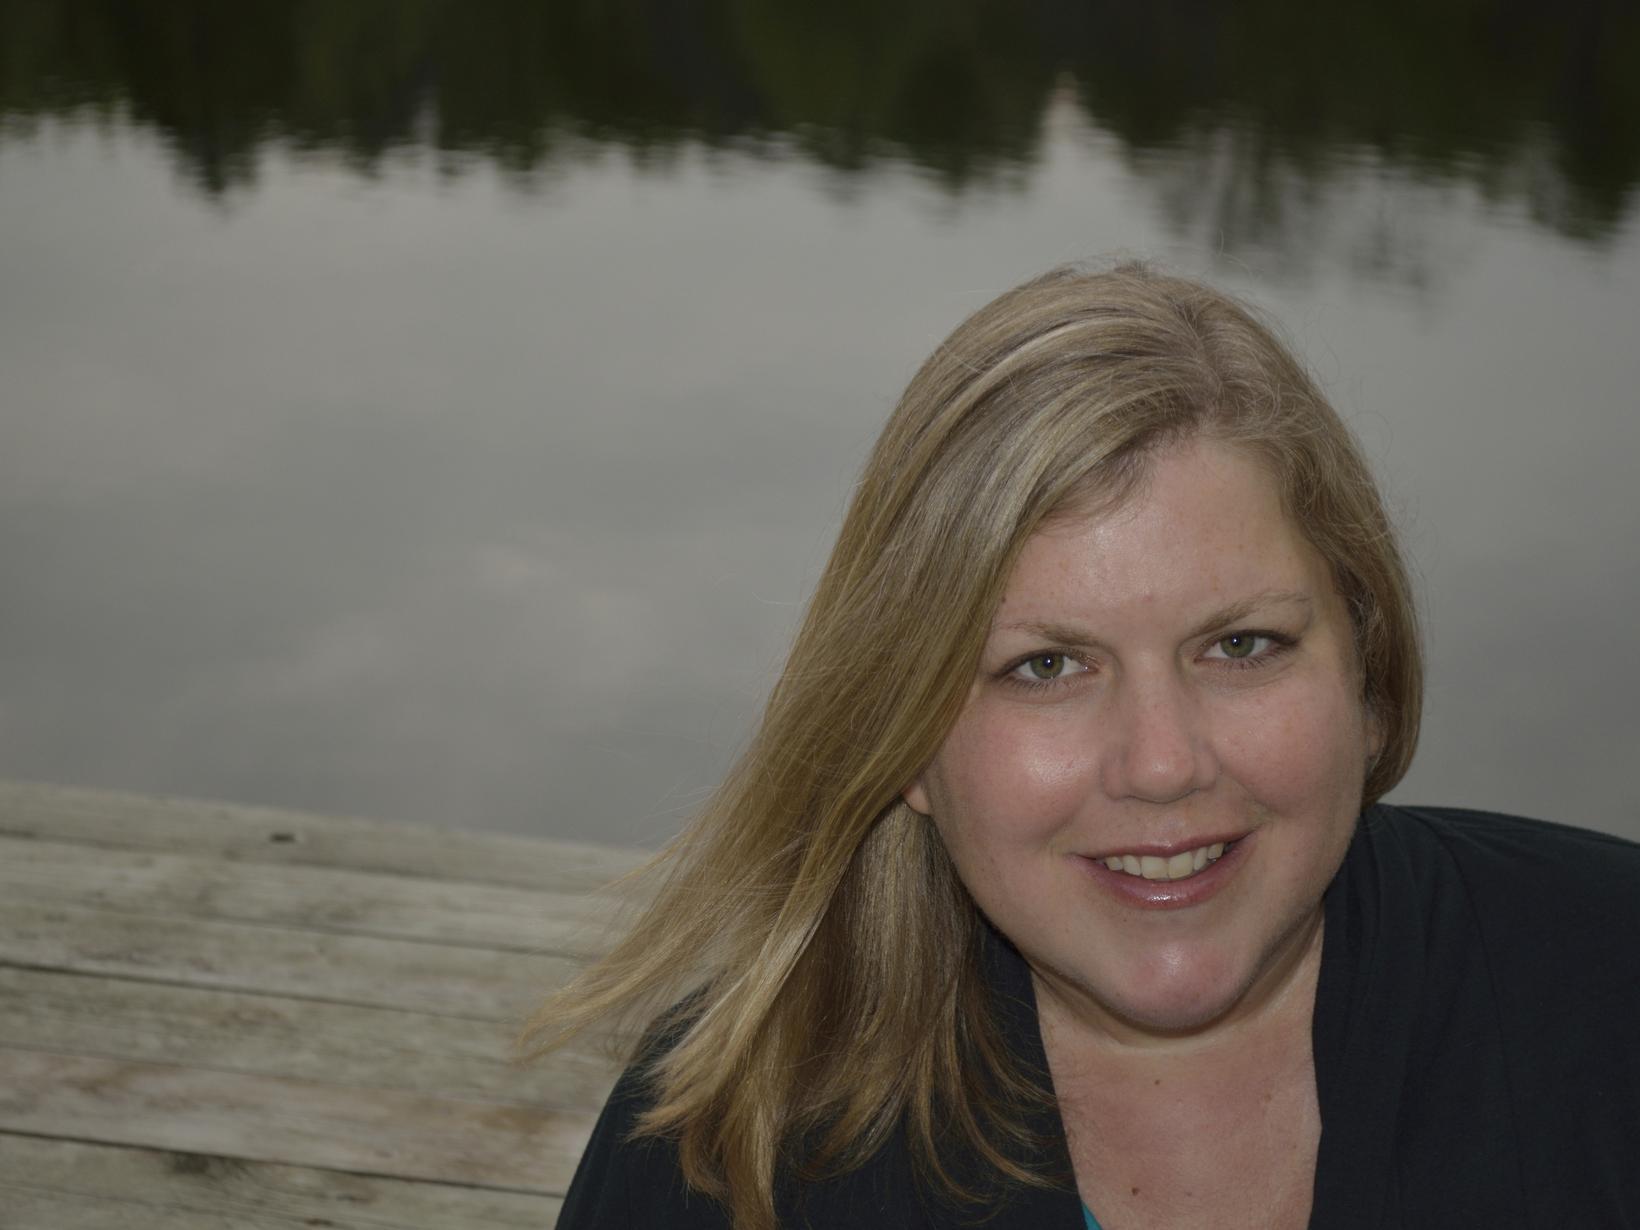 Julie from Grand Rapids, Michigan, United States